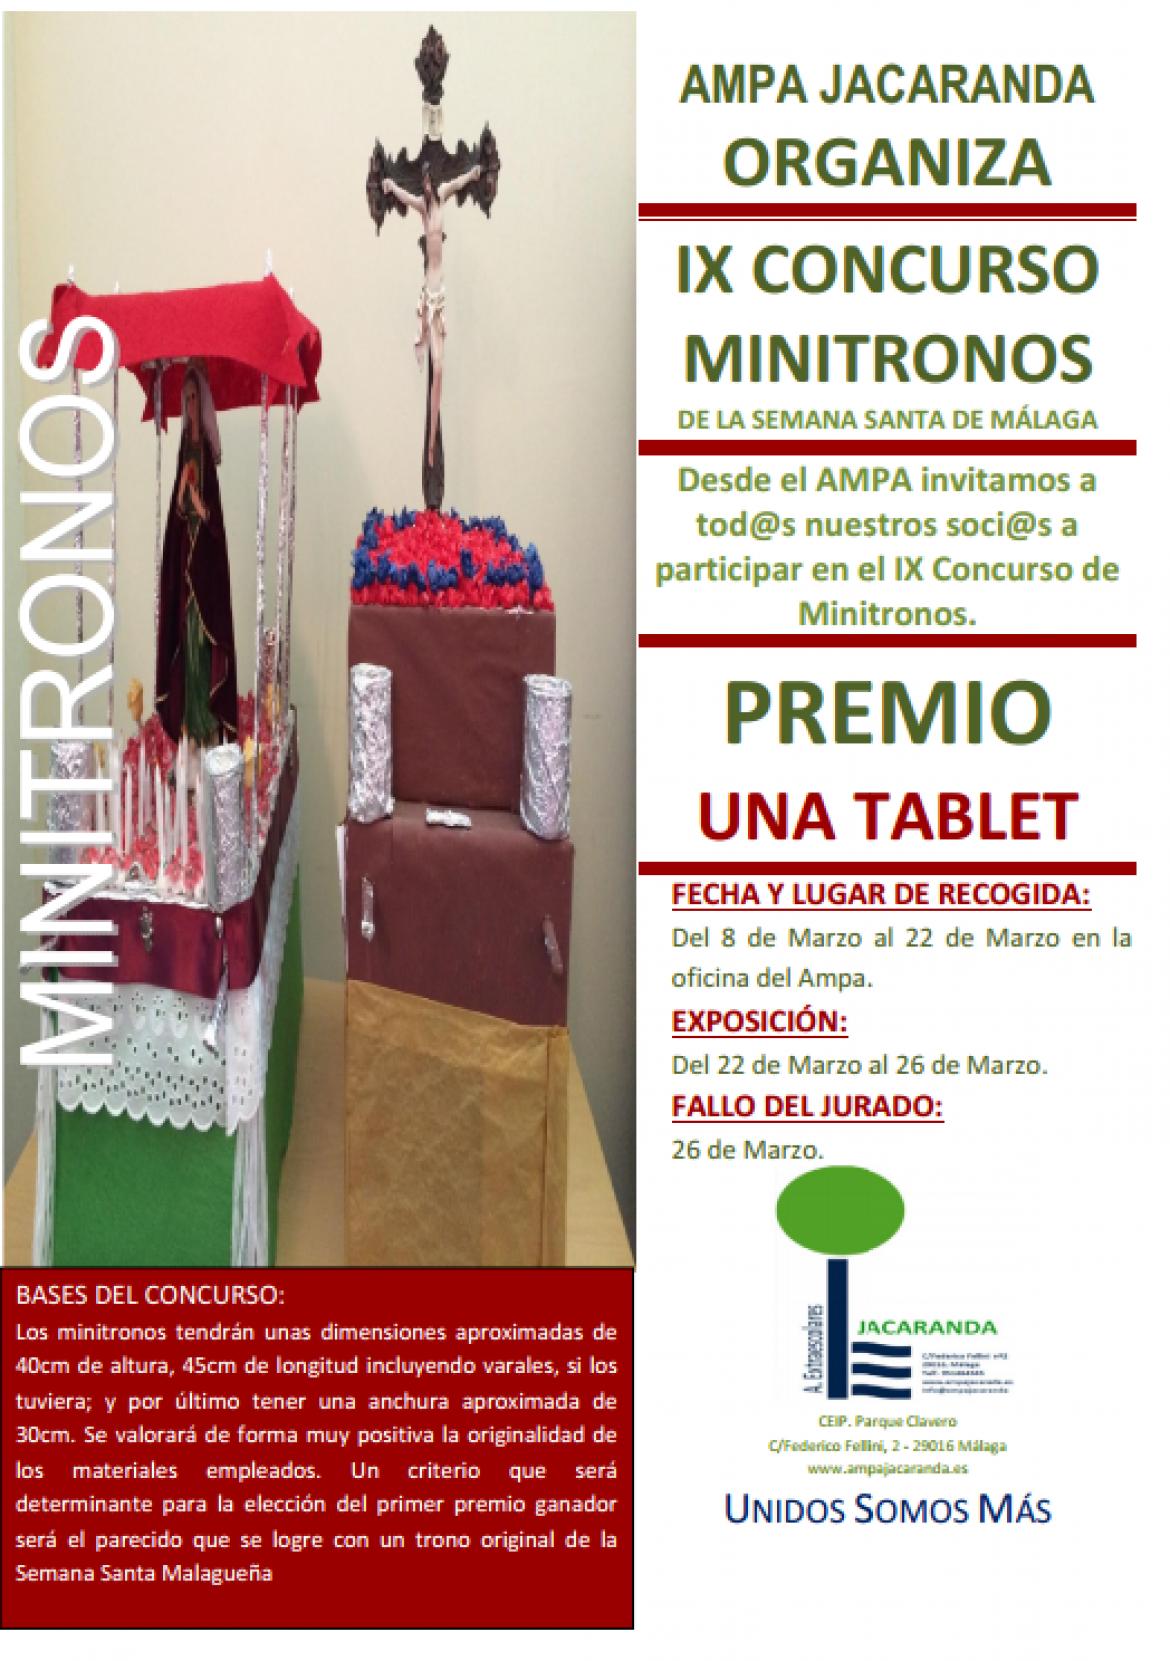 IX Concurso de MiniTronos